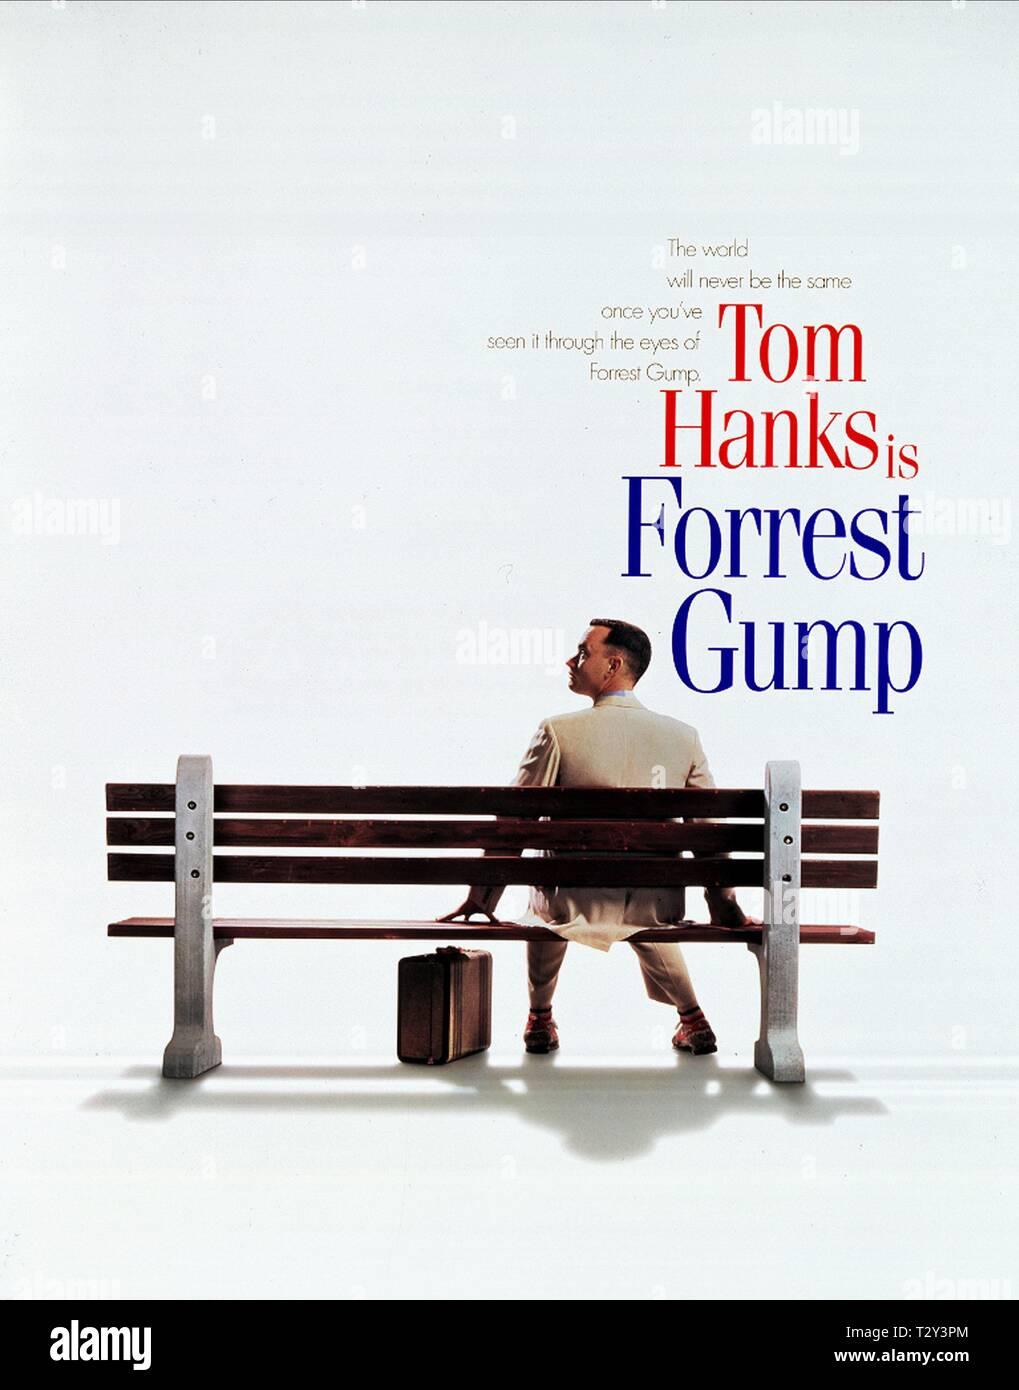 Tom Hanks Forrest Gump 1994 Stock Photo Alamy